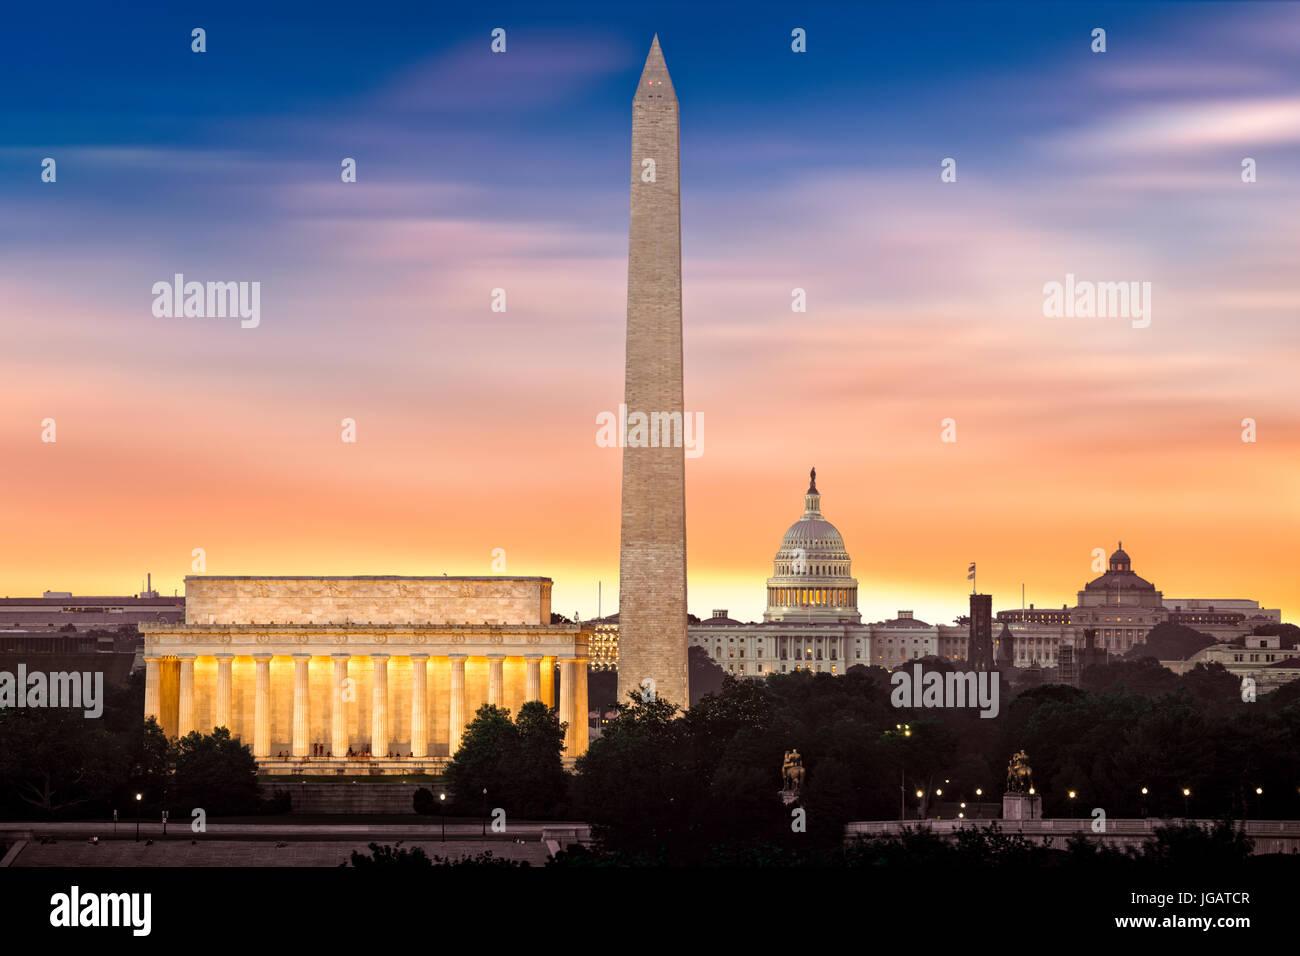 New Dawn über Washington - mit 3 berühmte Denkmäler beleuchtet bei Sonnenaufgang: Lincoln Memorial, Stockbild